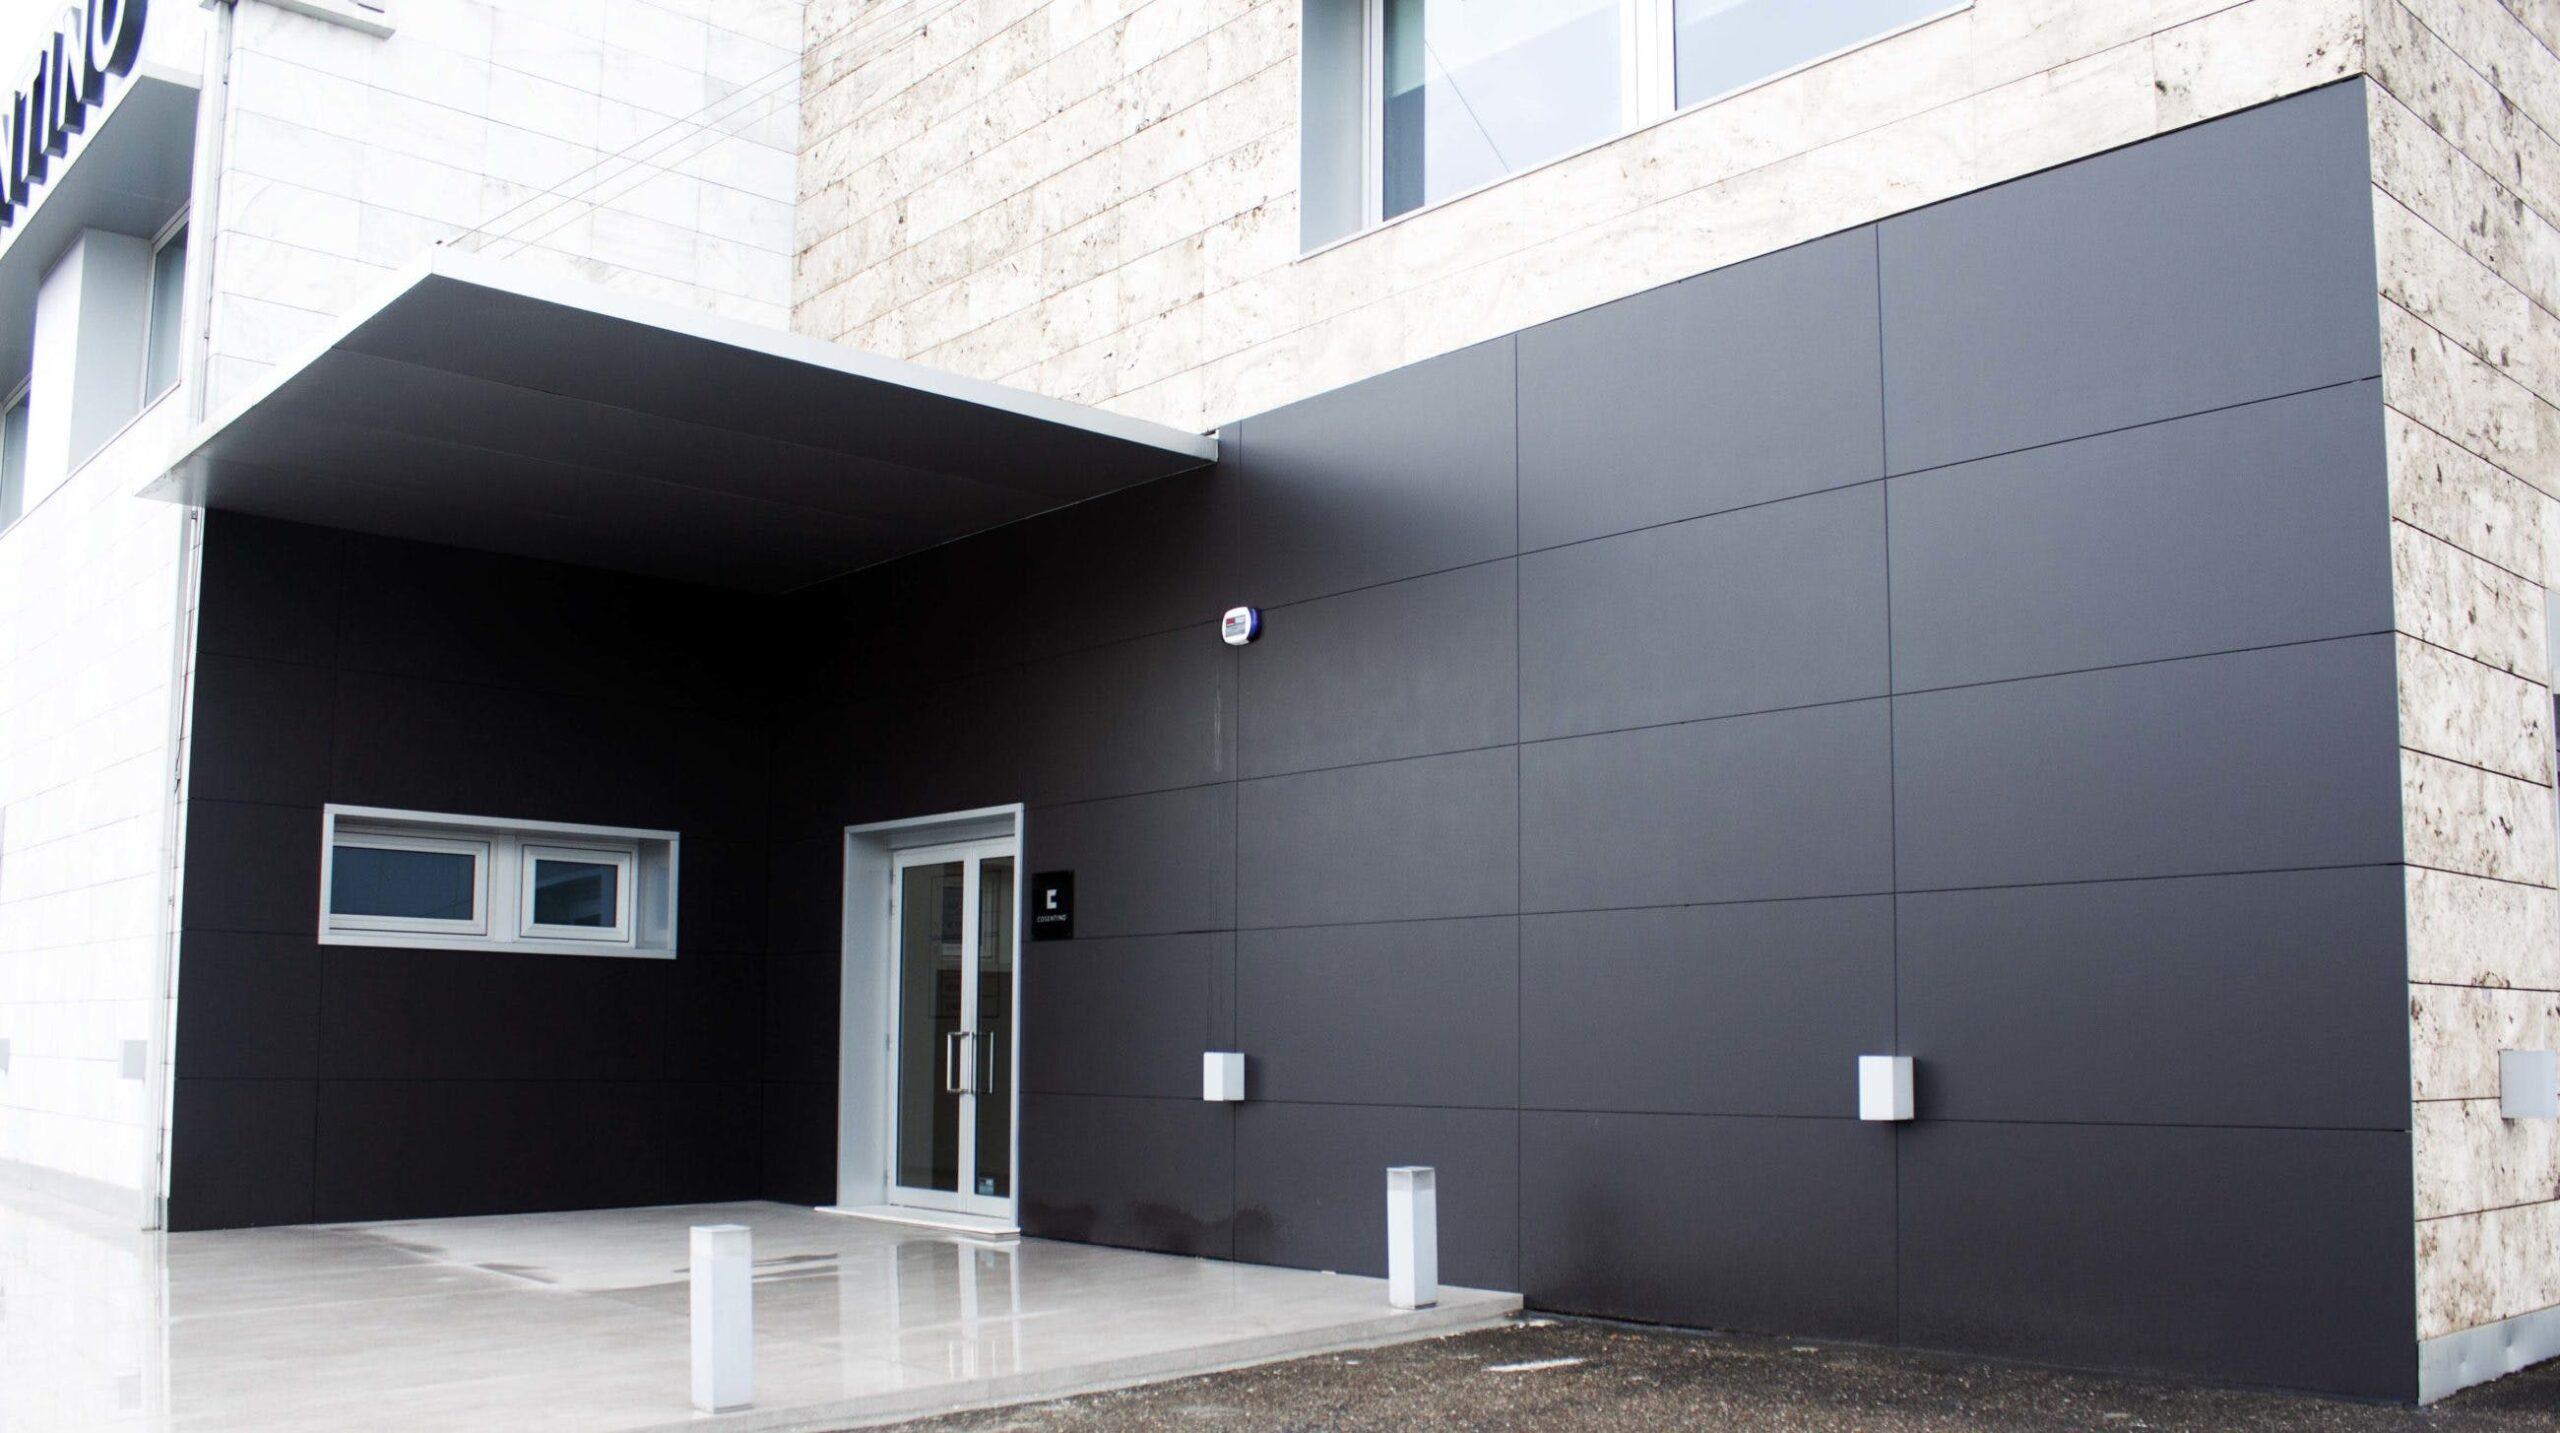 Image of Cosentino Vigo Center Fachada Dekton Domoos 1 scaled in Cosentino Center Vigo undertakes a beautiful renovation - Cosentino